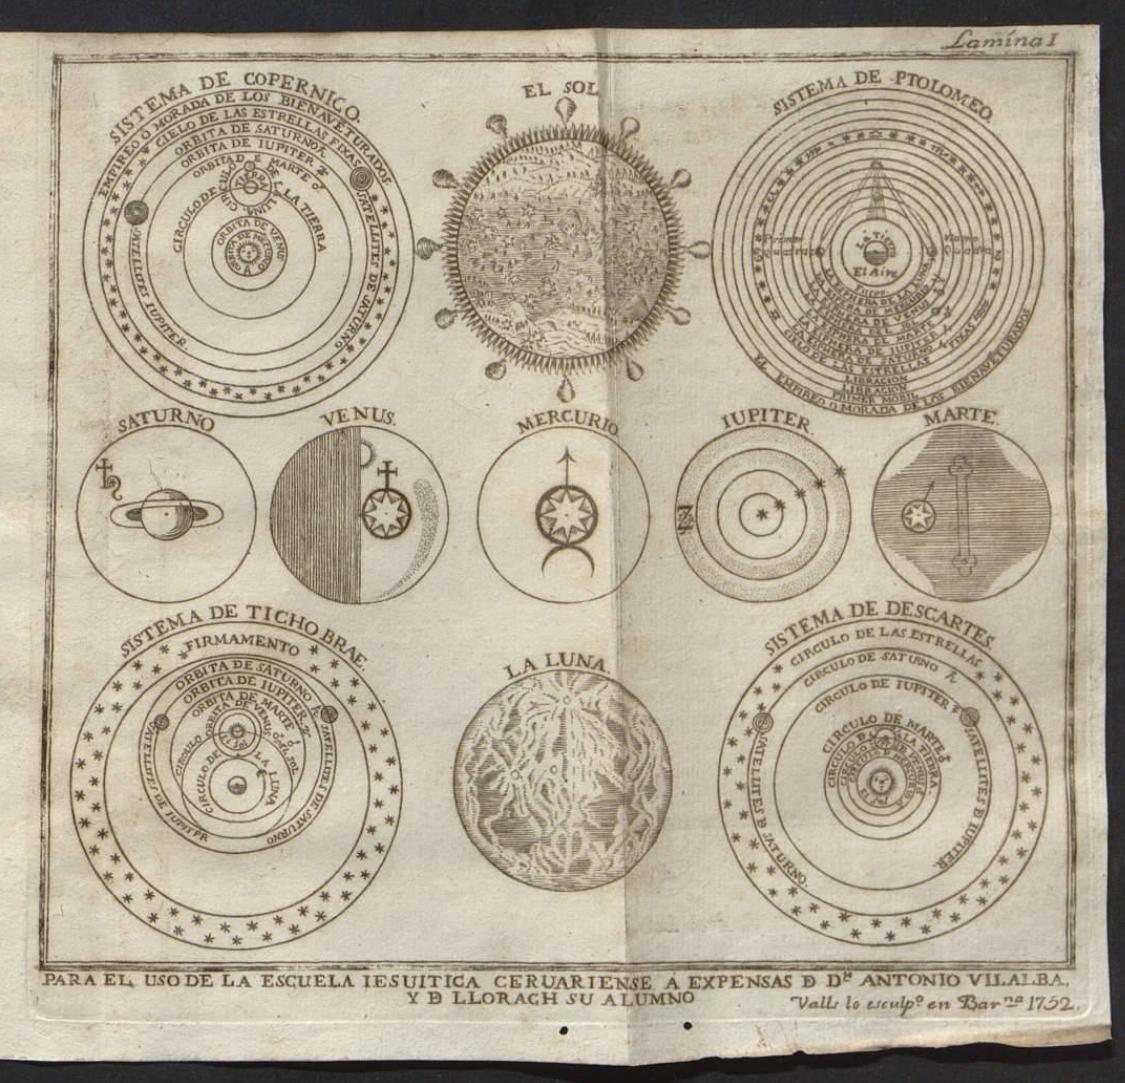 Jesuiticae philosophiae theses – 1753 'GEMISTE' KANS